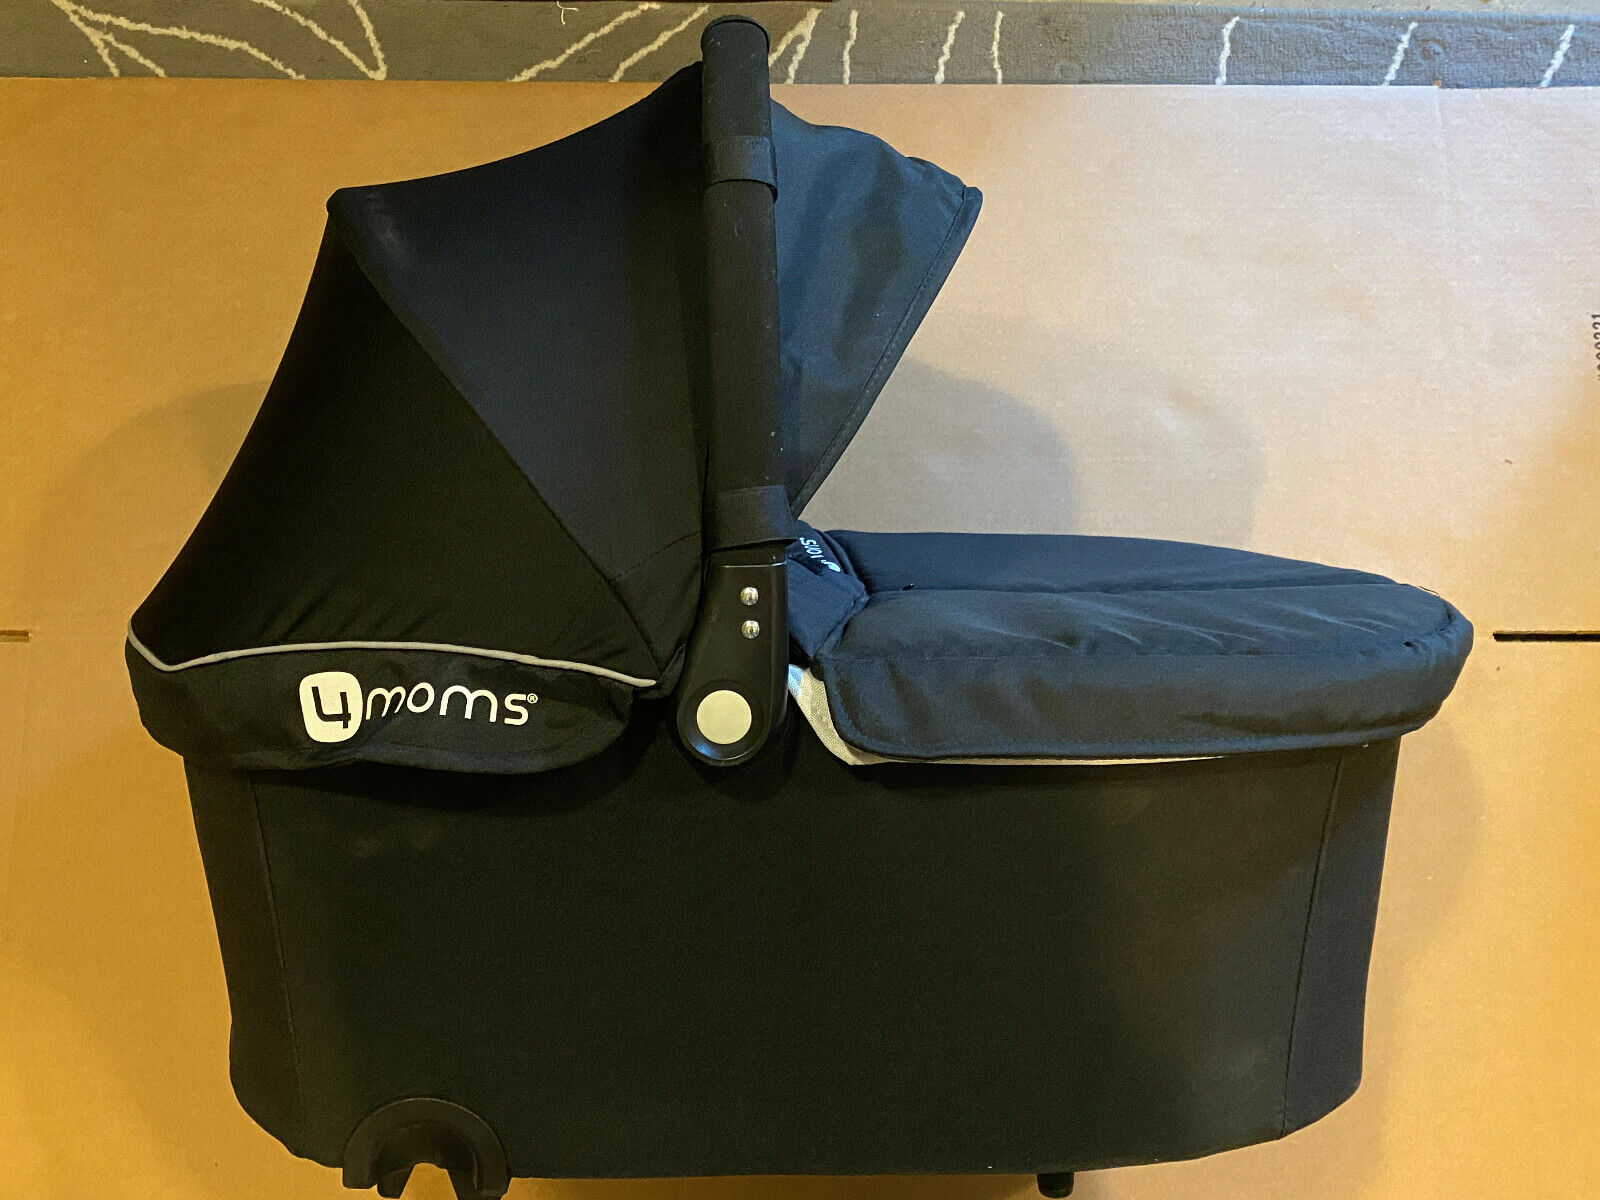 4moms Stroller origami 2019 - Buy at kidsroom | Strollers | 1200x1600